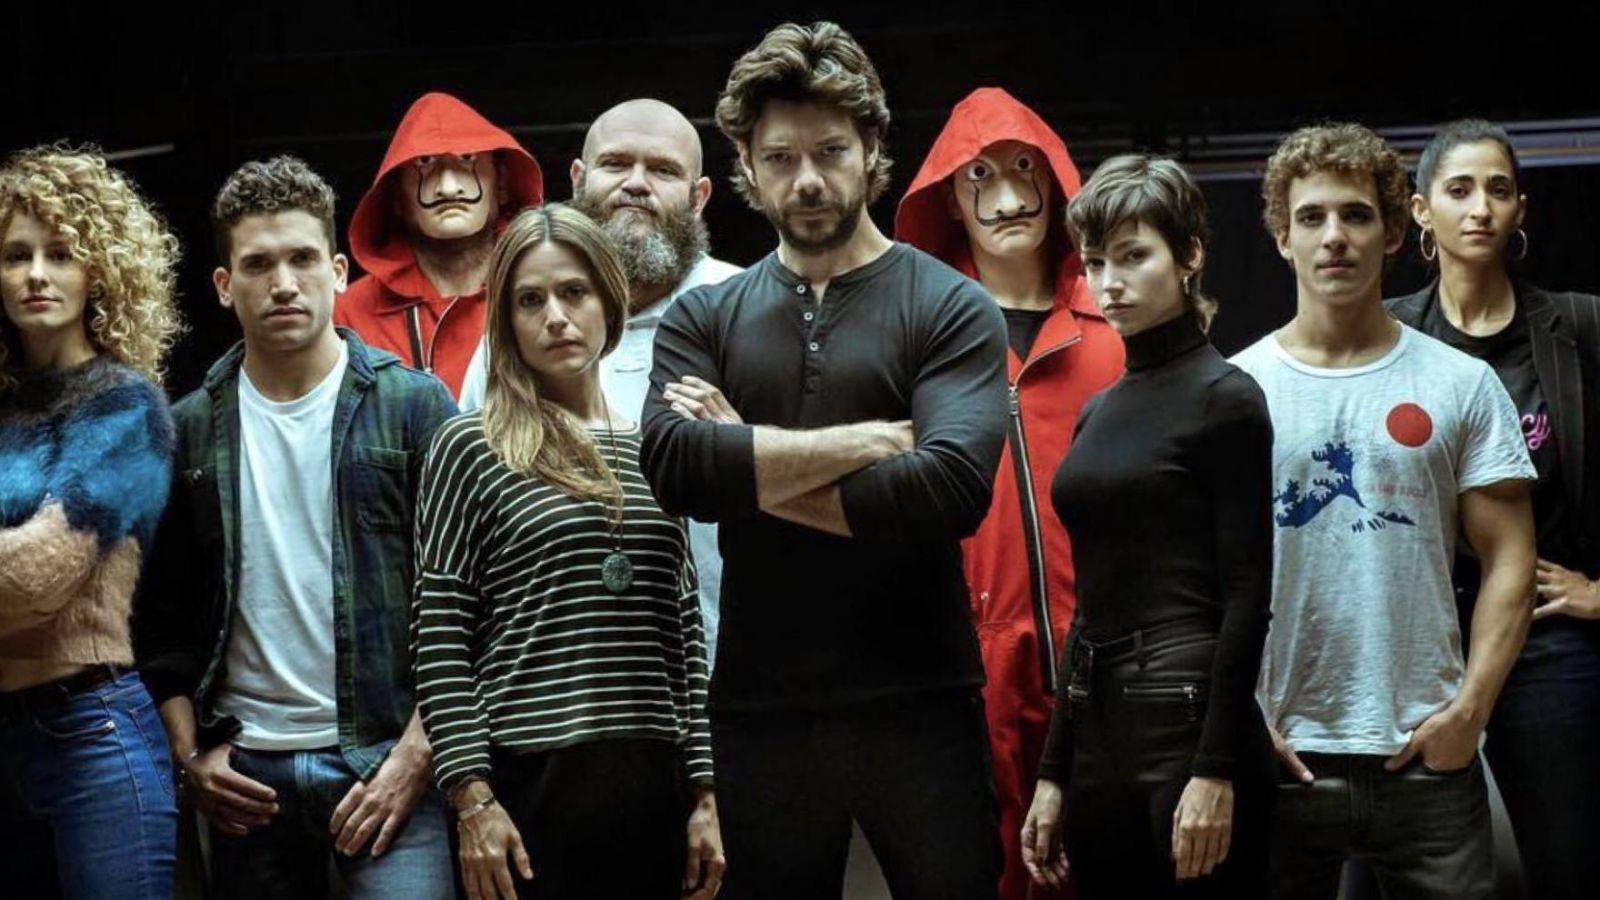 La Casa de Papel: Ο Άλεξ Πίνα ανακοίνωσε τη συνέχεια της σειράς με τον πιο  πρωτότυπο τρόπο [pic]